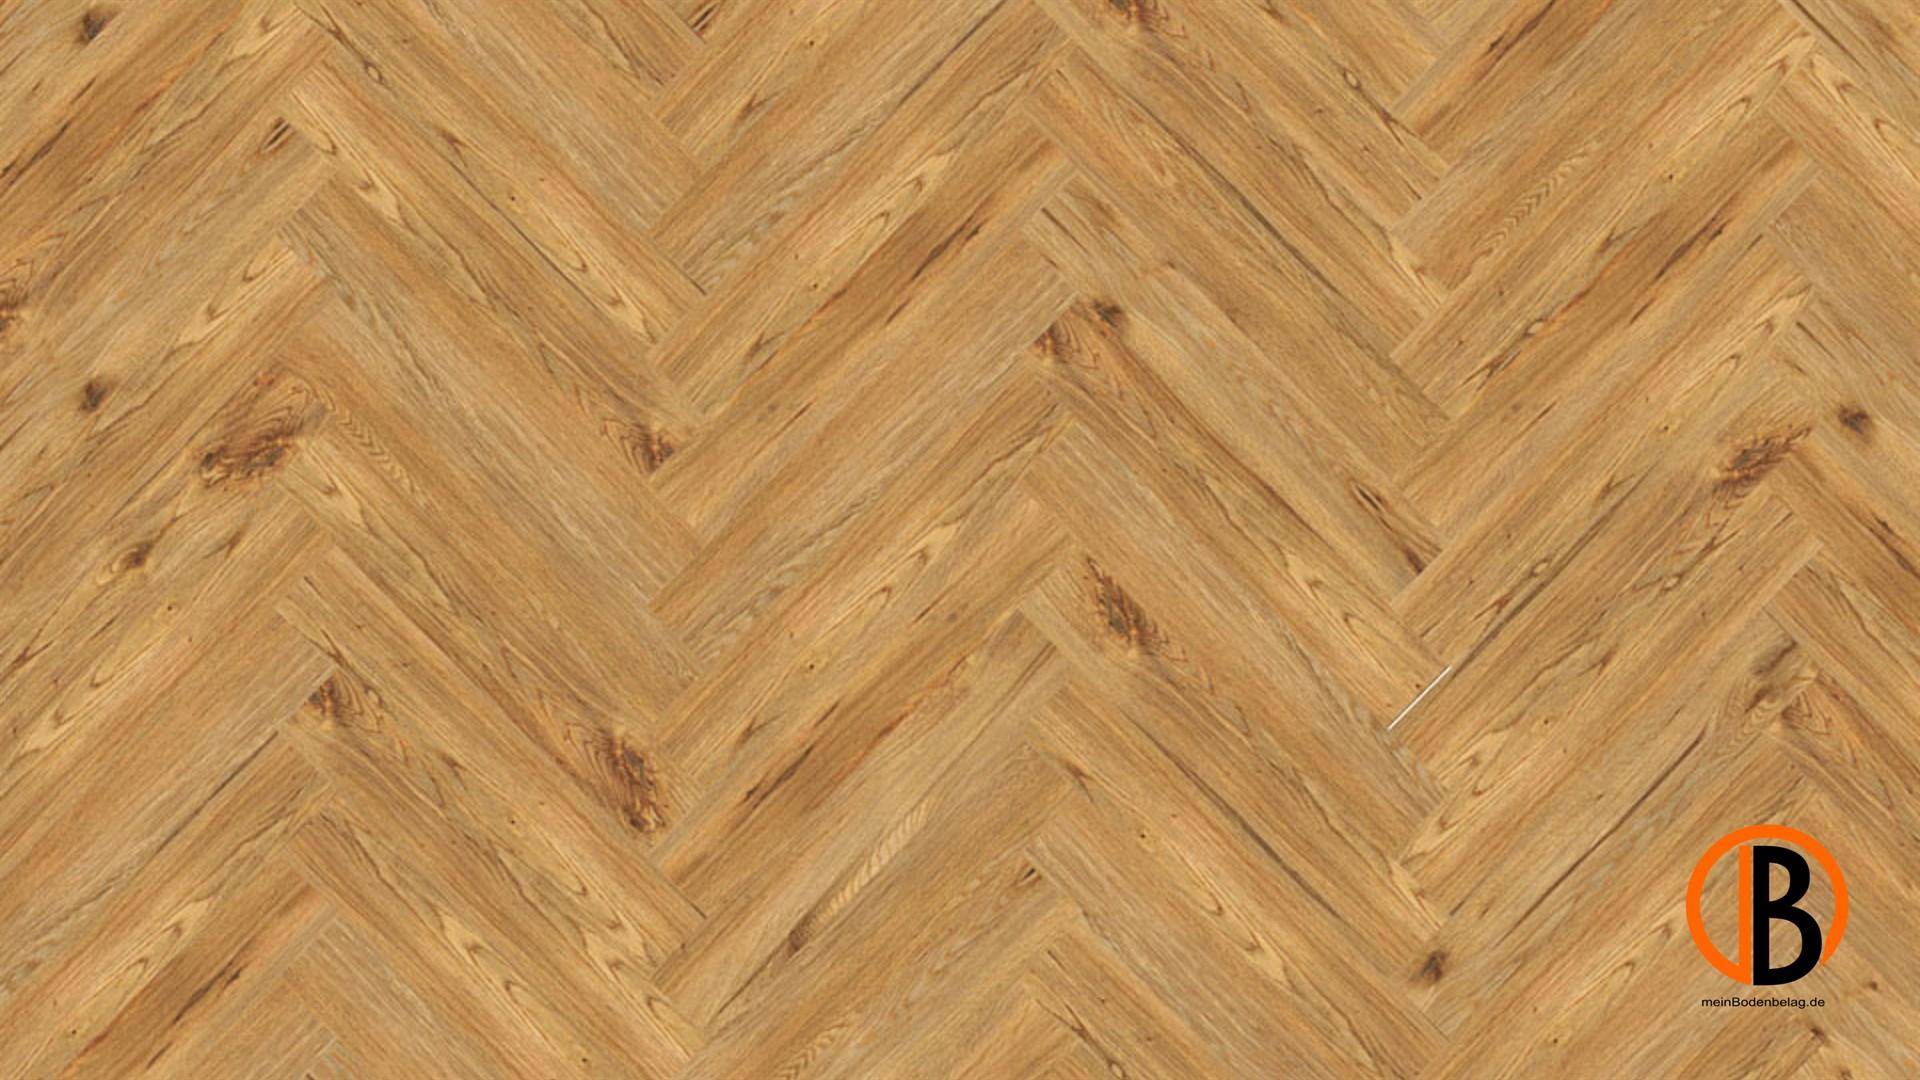 CINQUE PROJECT FLOORS VINYL HERINGBONE | 10002507;0 | Bild 1